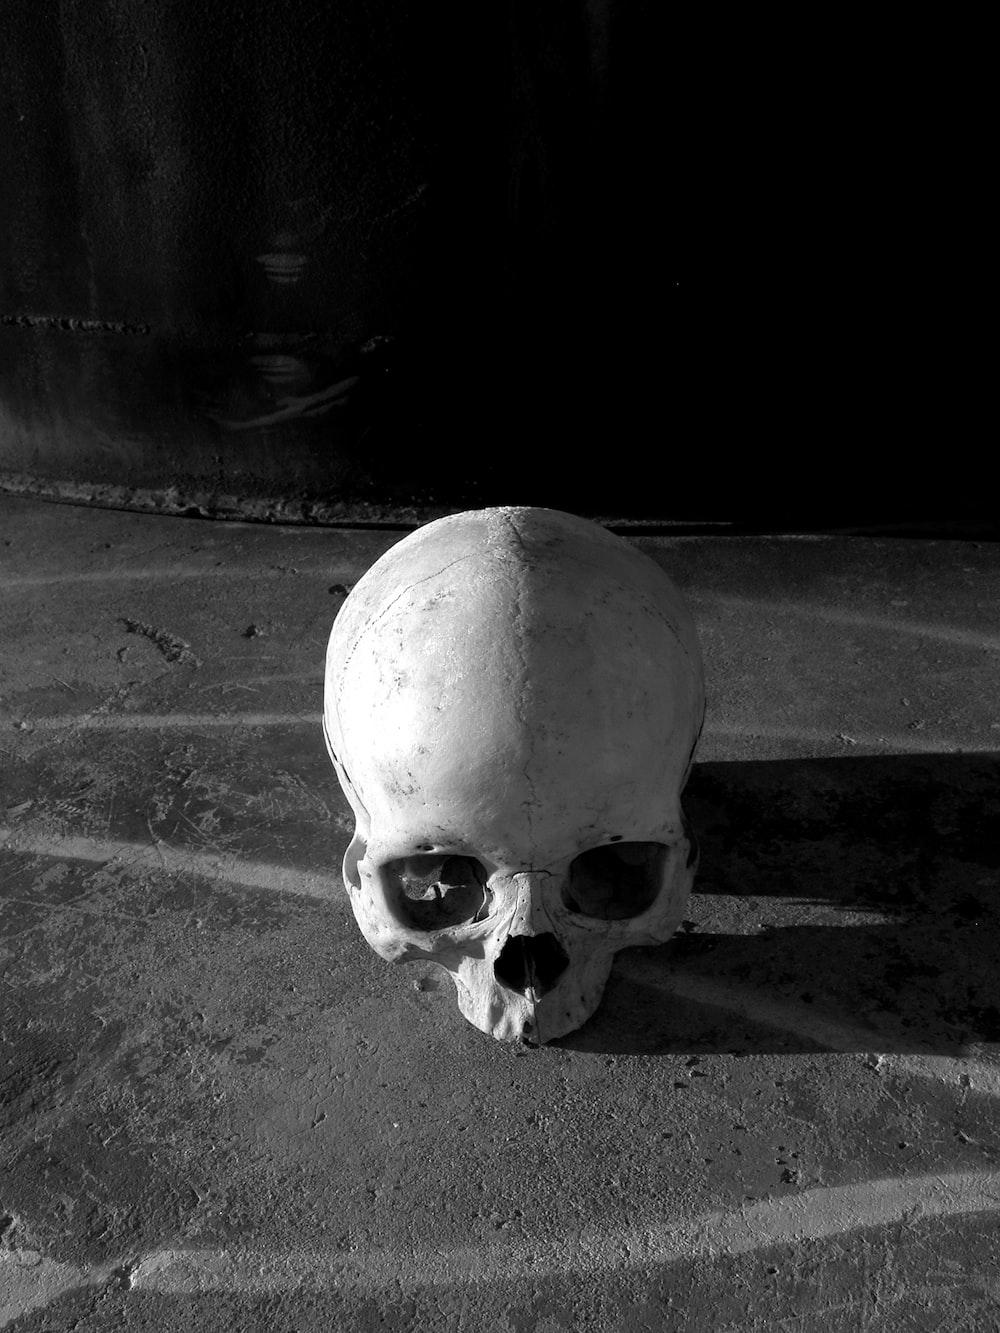 Human skull and shadows hd photo by matt artz mattartz on unsplash